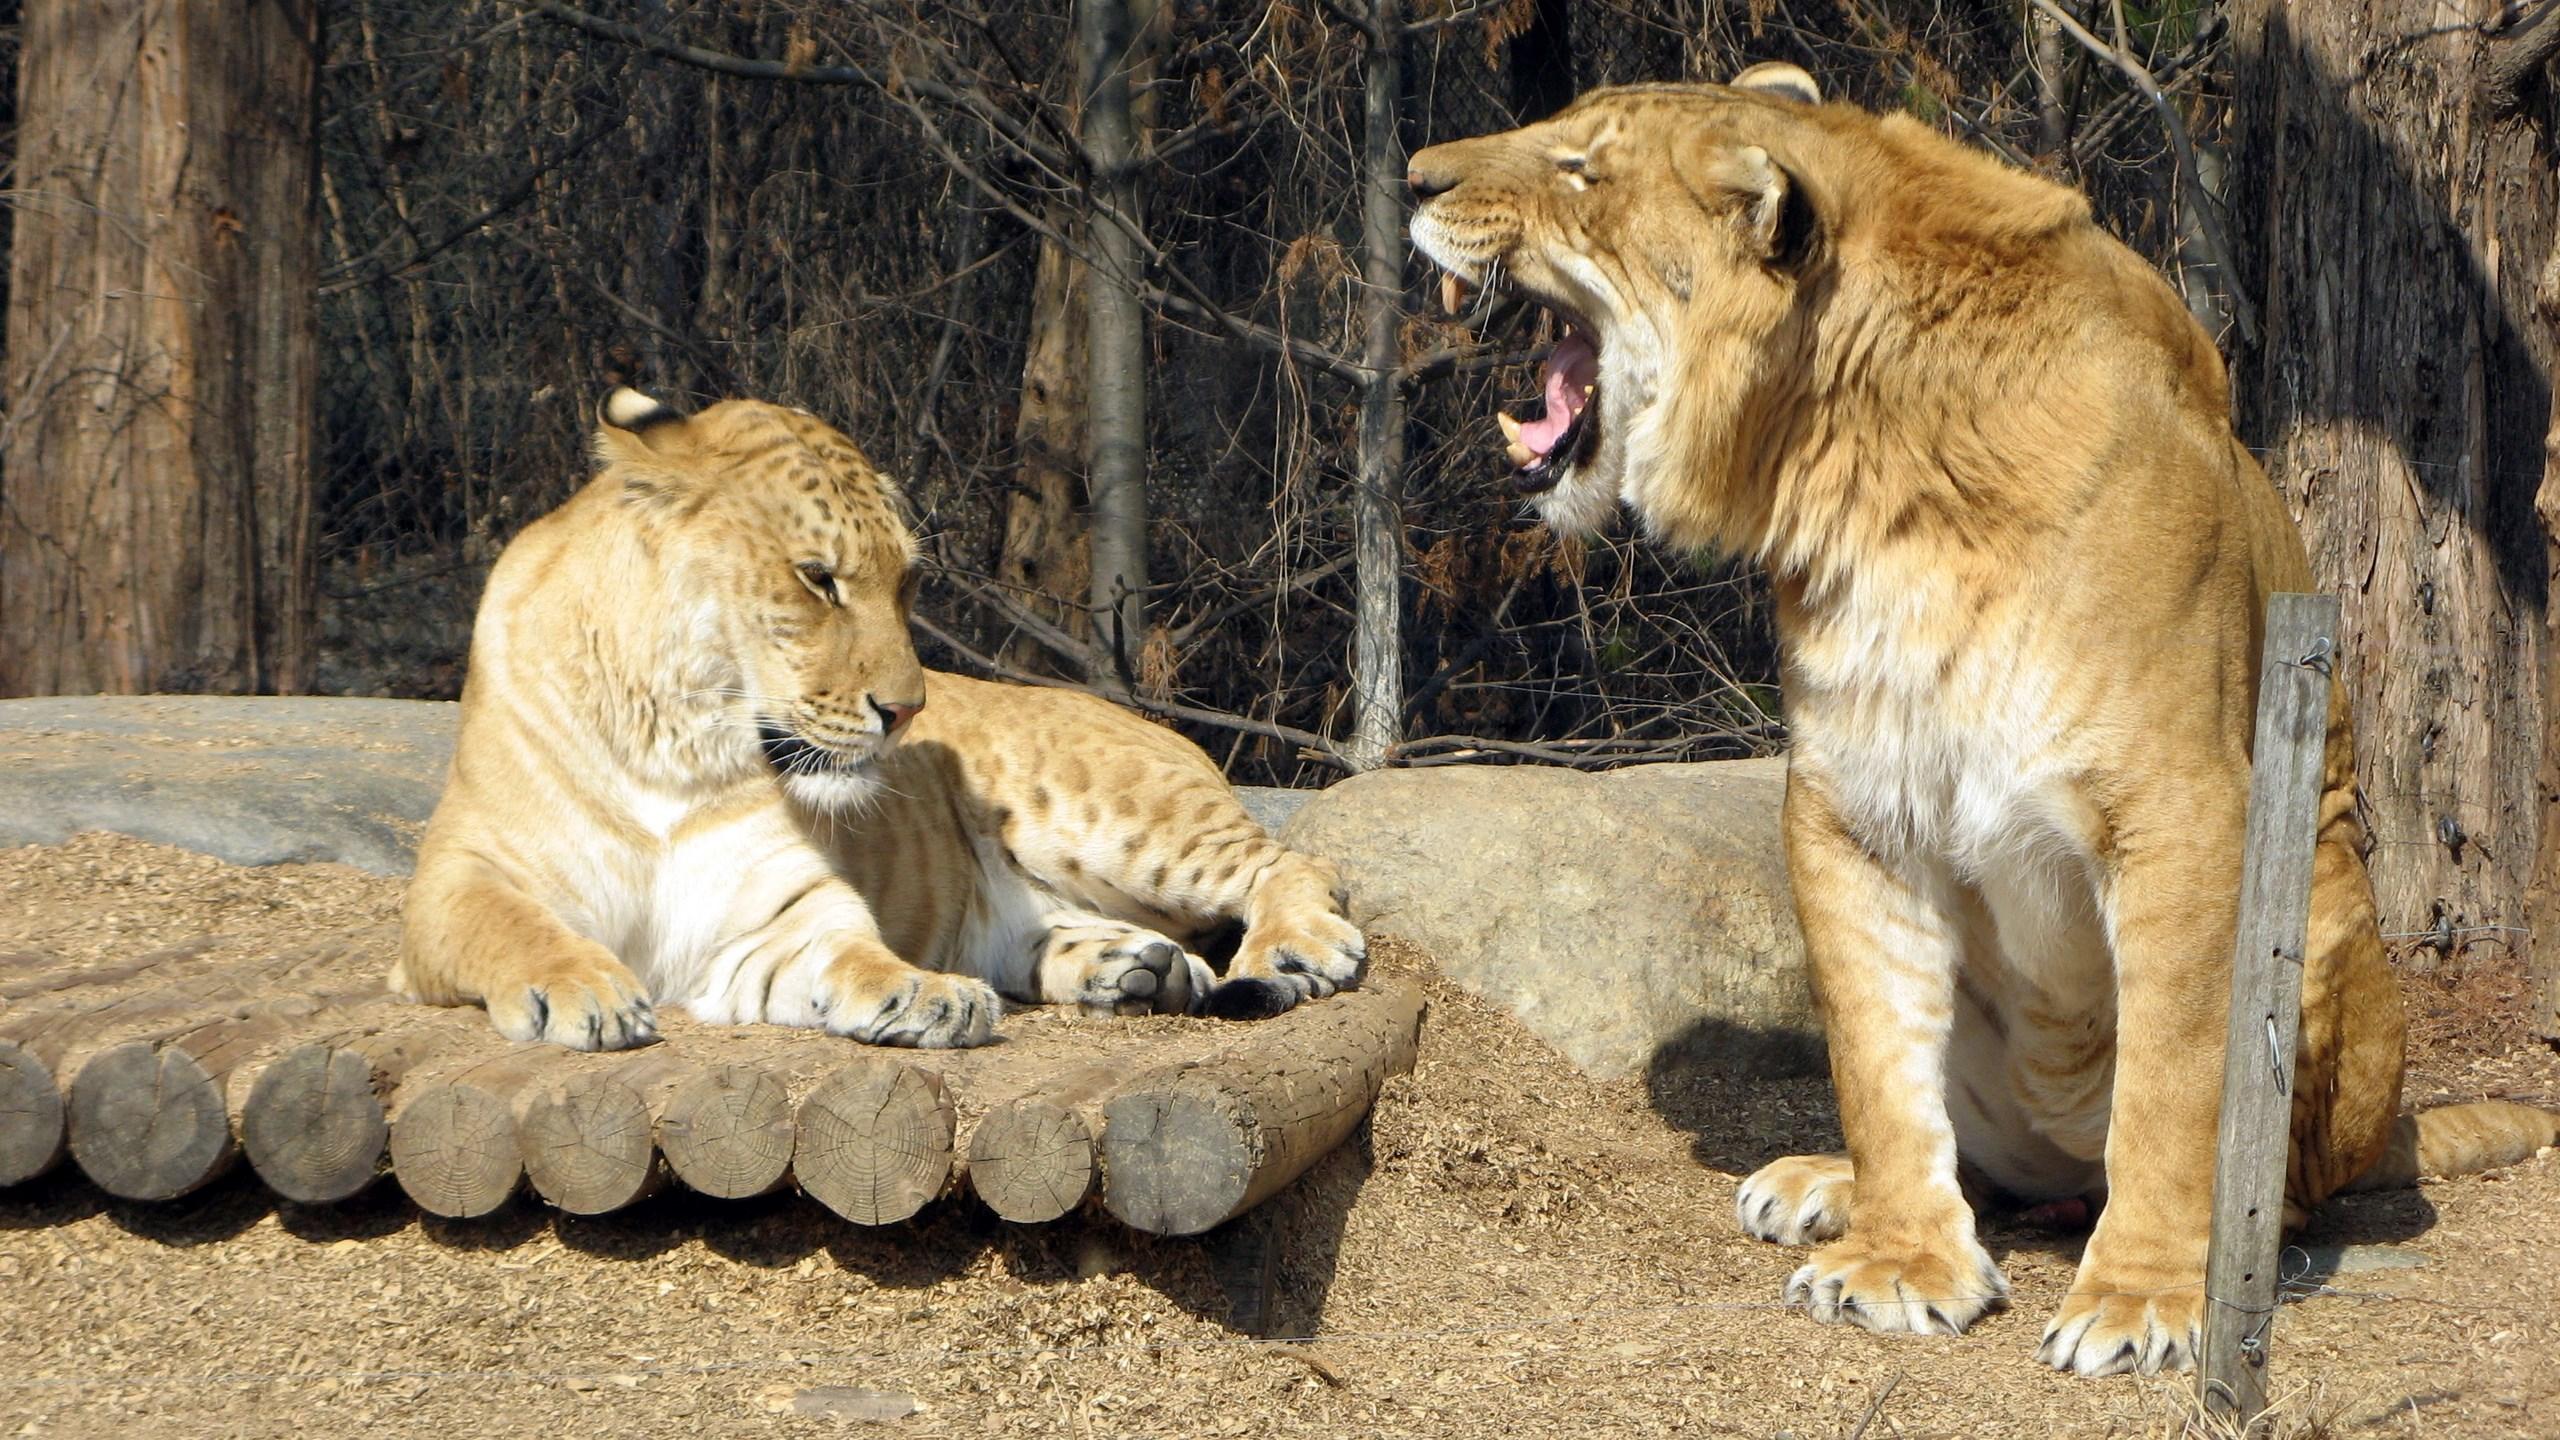 Roaring Lion Hd Wallpaper - Hybrid Animals Real , HD Wallpaper & Backgrounds